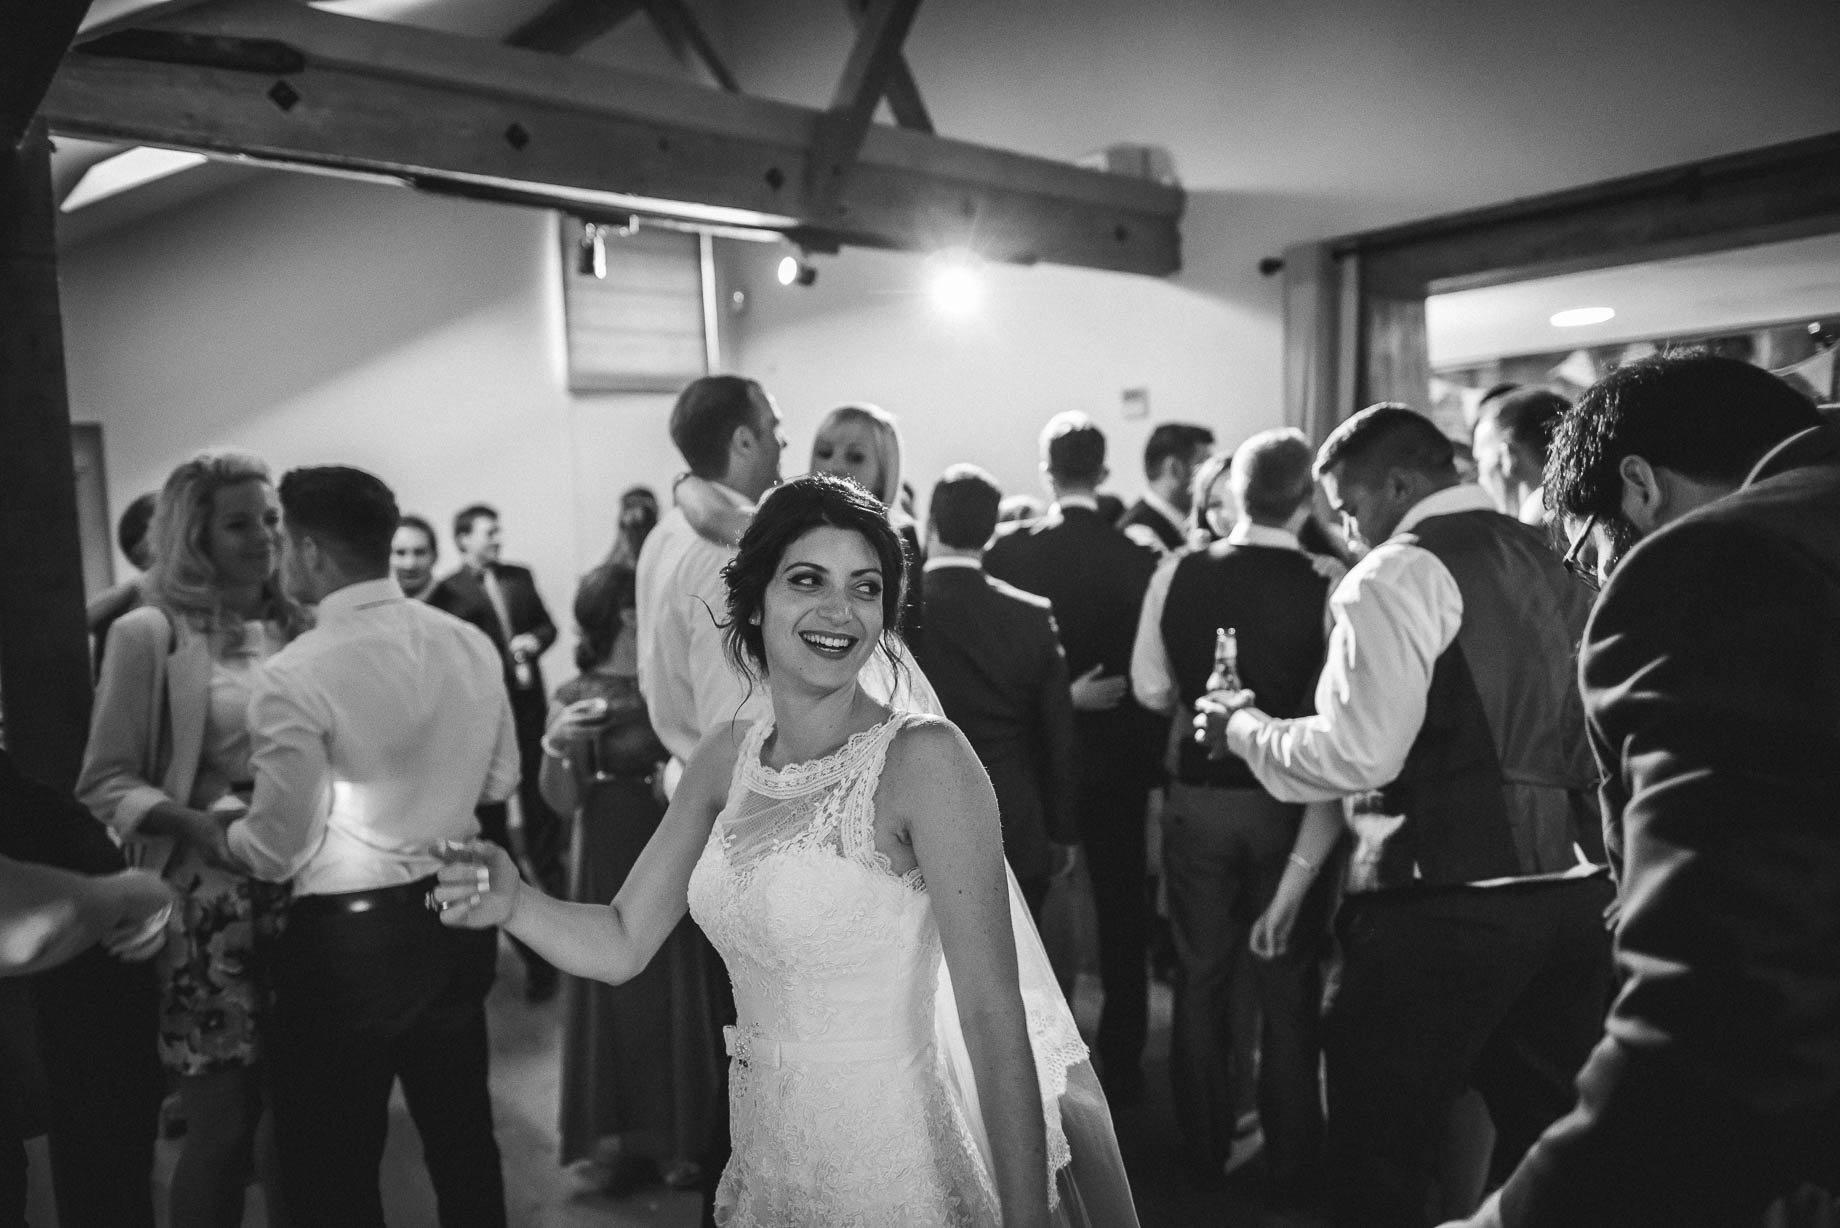 Gaynes Park wedding photography - Guy Collier Photography - Rachel and Jon (167 of 169)